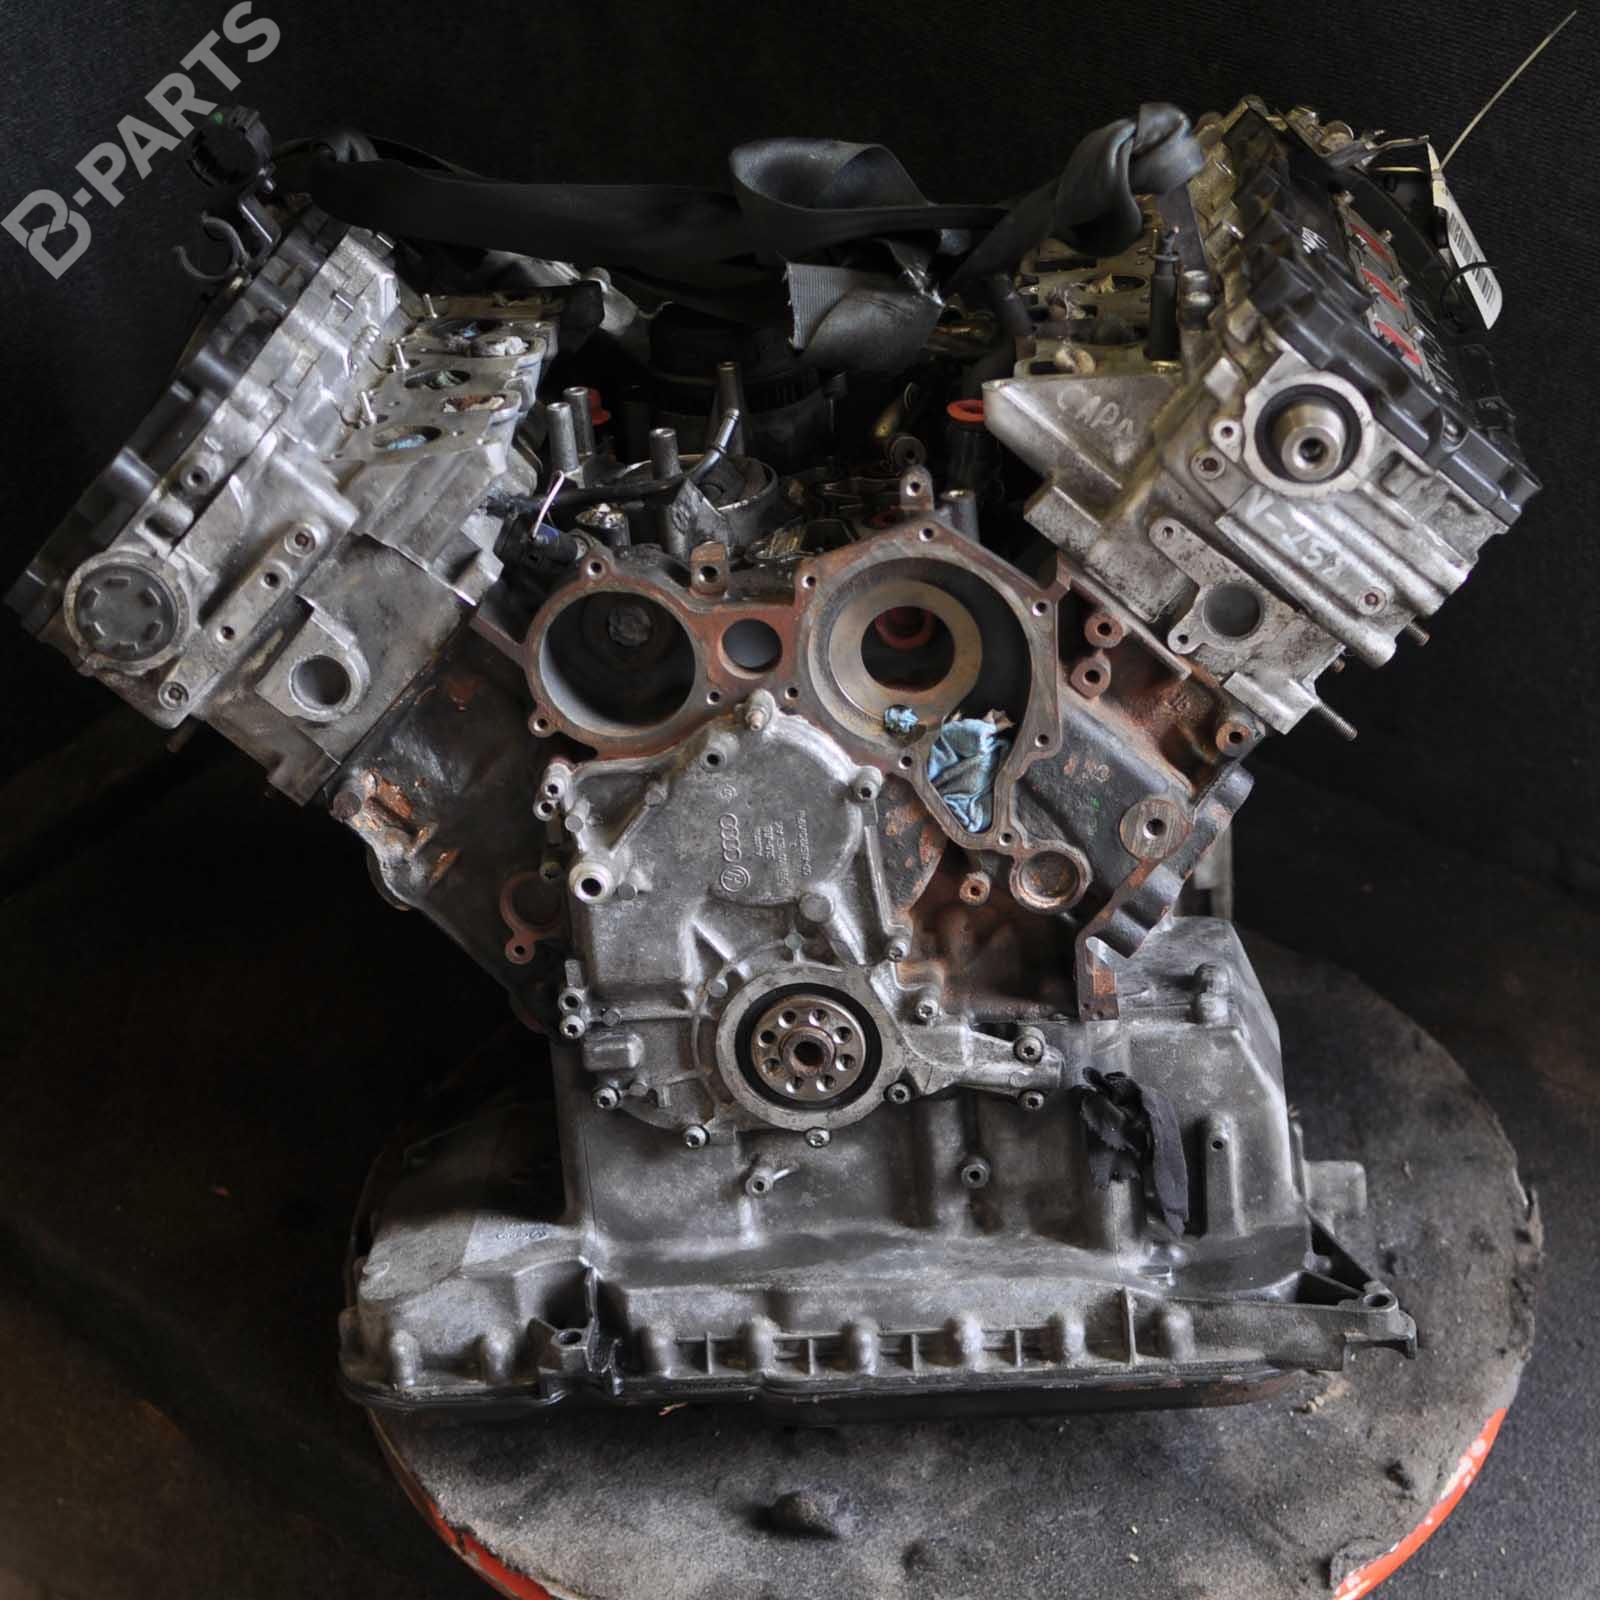 2011 Audi A4 Engine: Motor AUDI A4 (8K2, B8) 3.0 TDI Quattro